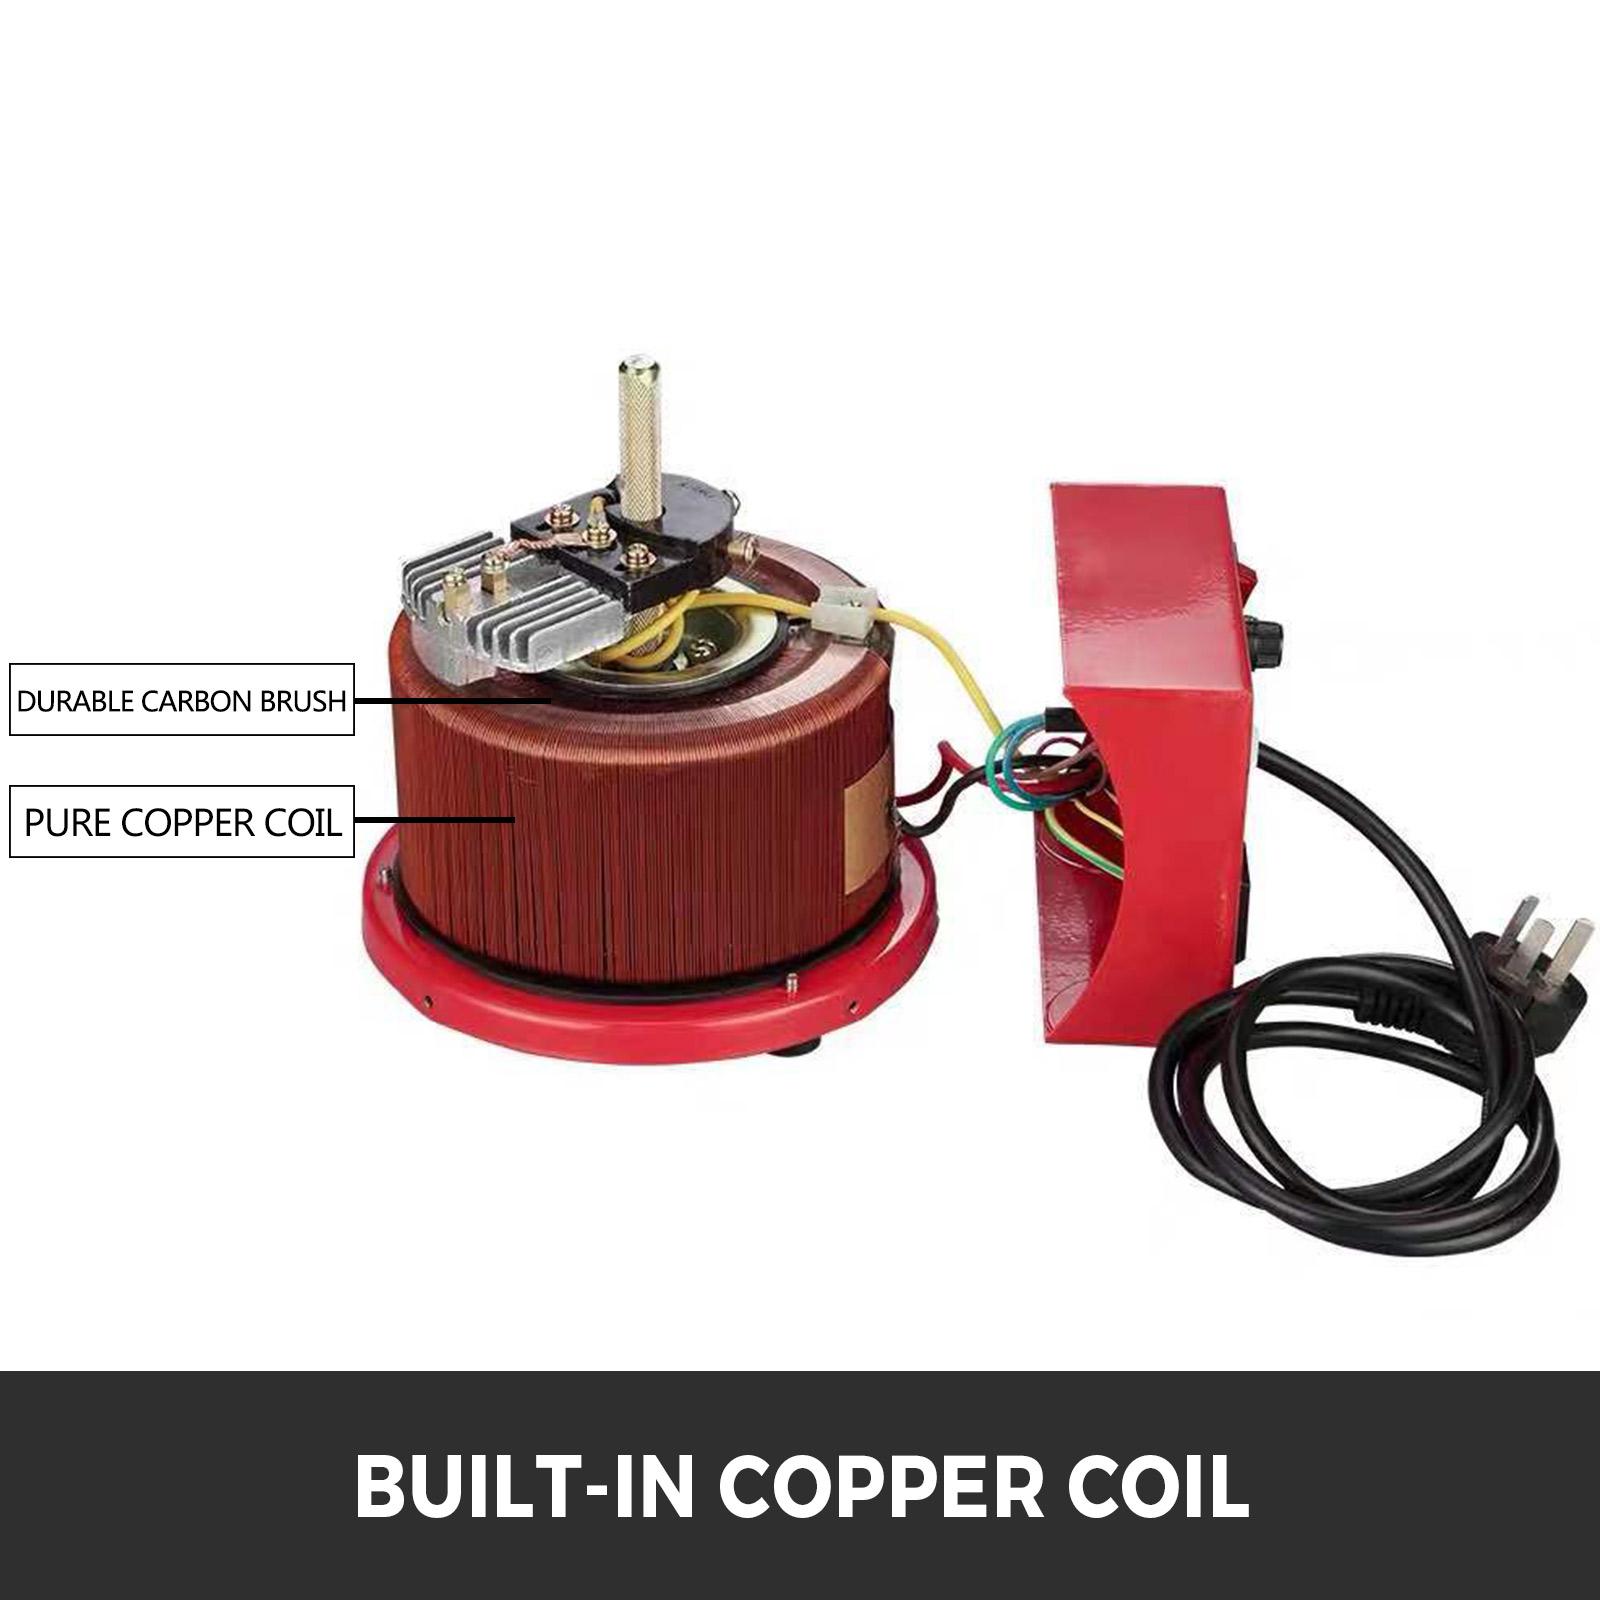 Auto-Variac-Variable-Transformer-0-5-1-2-3KVA-Regulator-pure-copper-coil-220V thumbnail 26